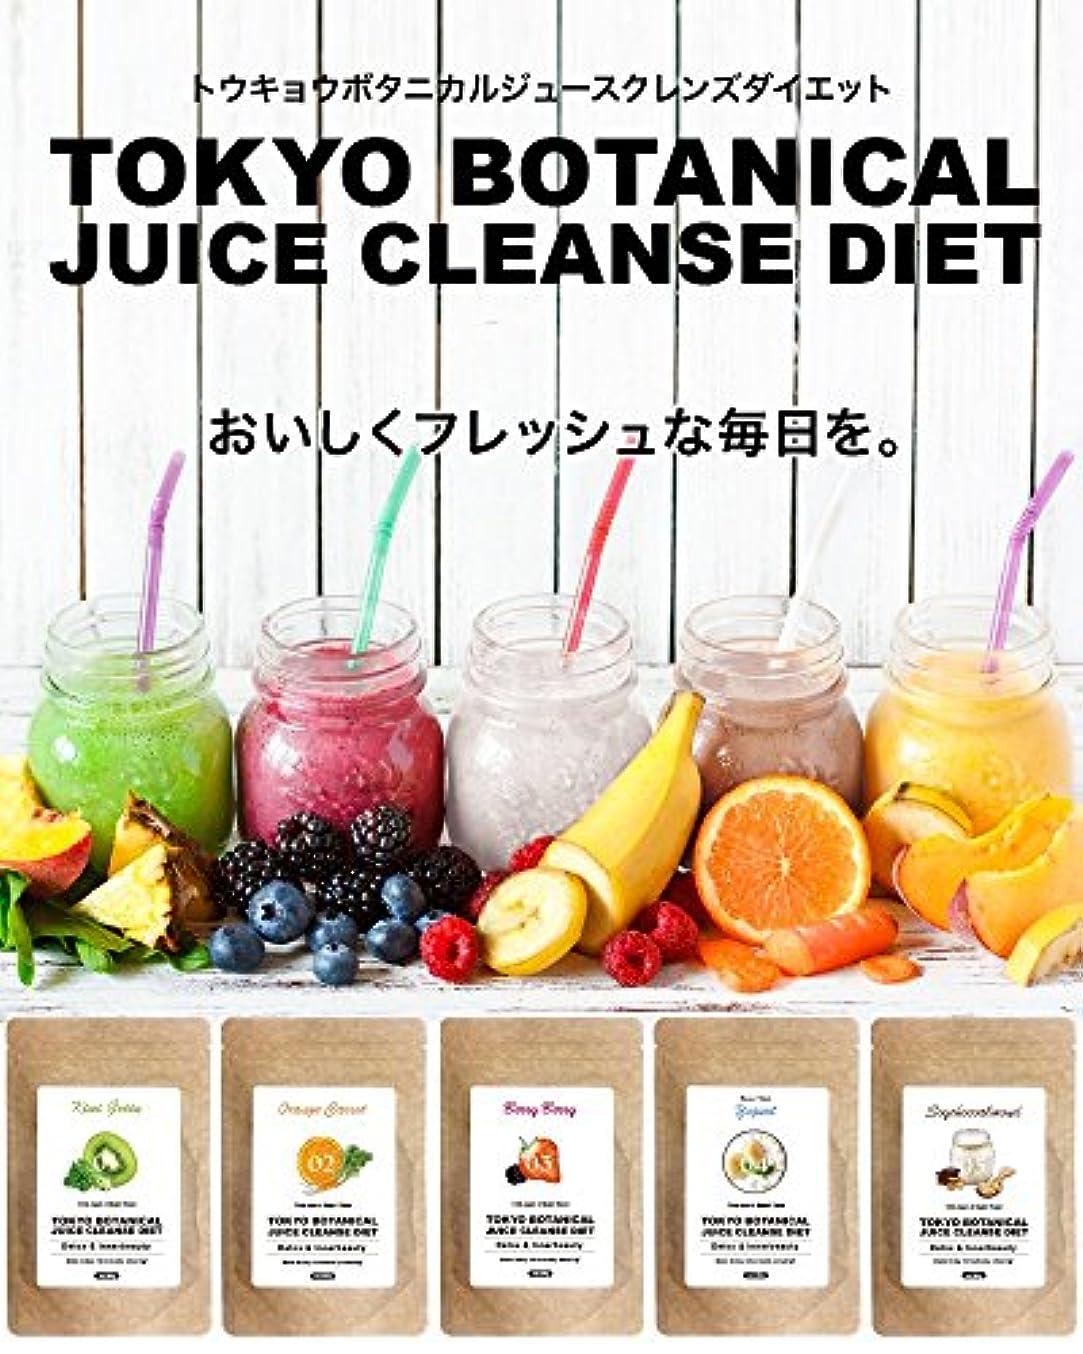 事業内容筋有毒なTOKYO BOTANICAL JUICE CLEANSE DIET(Kiwi Green)